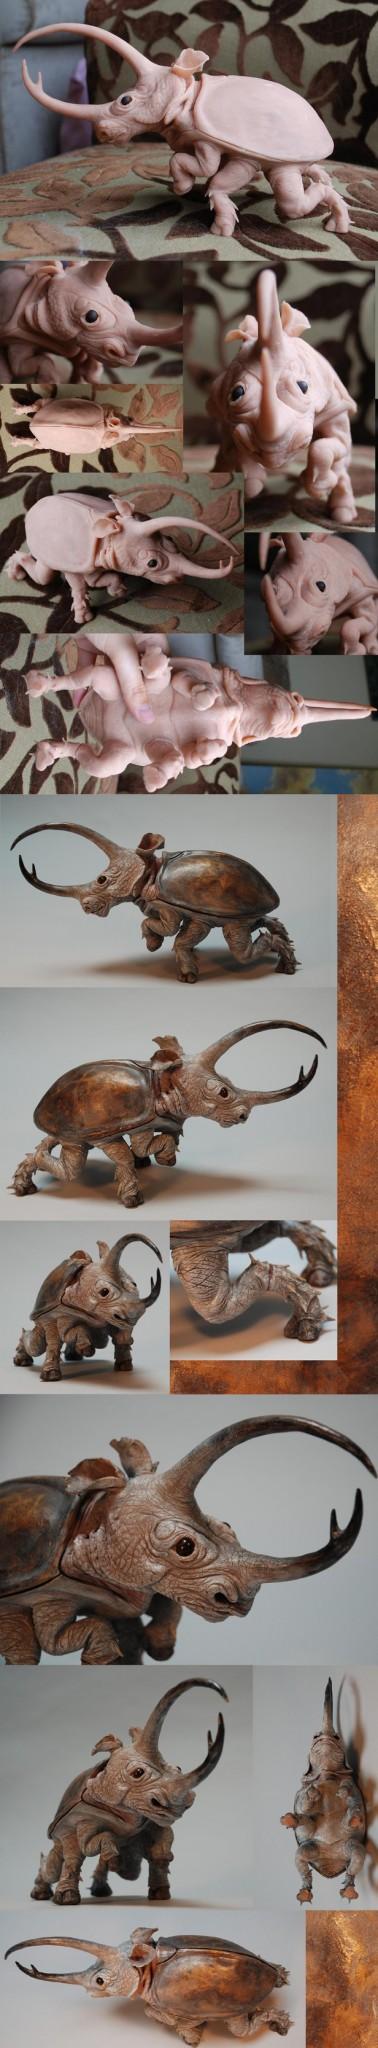 rhinobeetle2